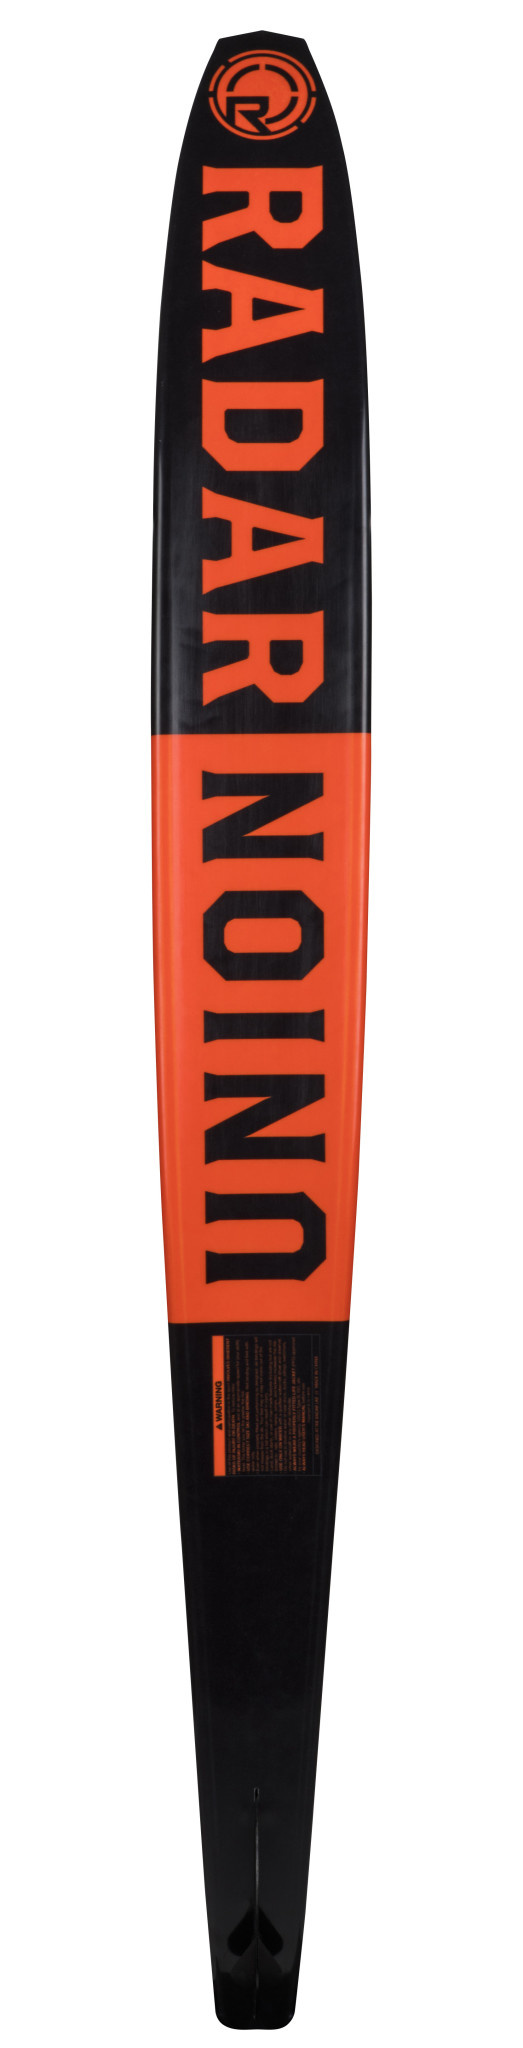 Union-2